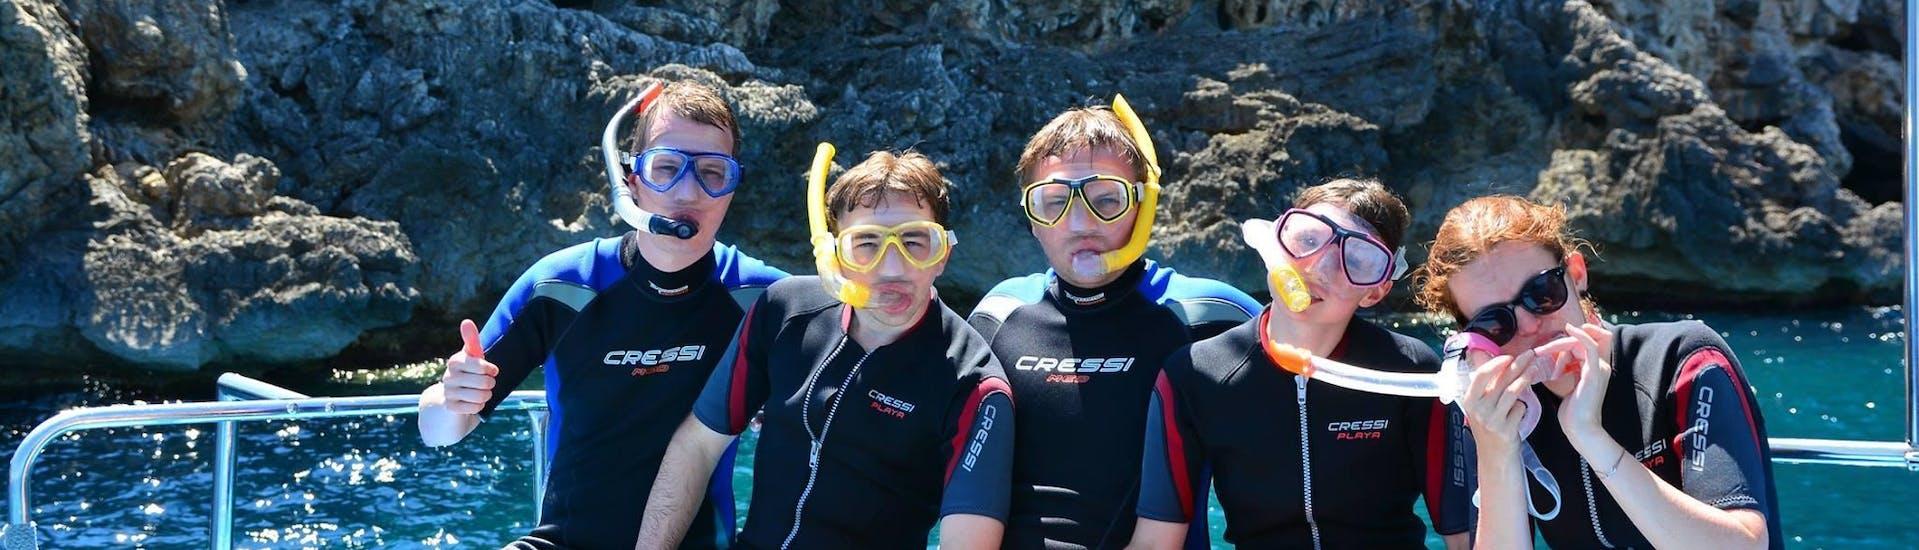 snorkeling---port-dandratx-balear-divers-hero